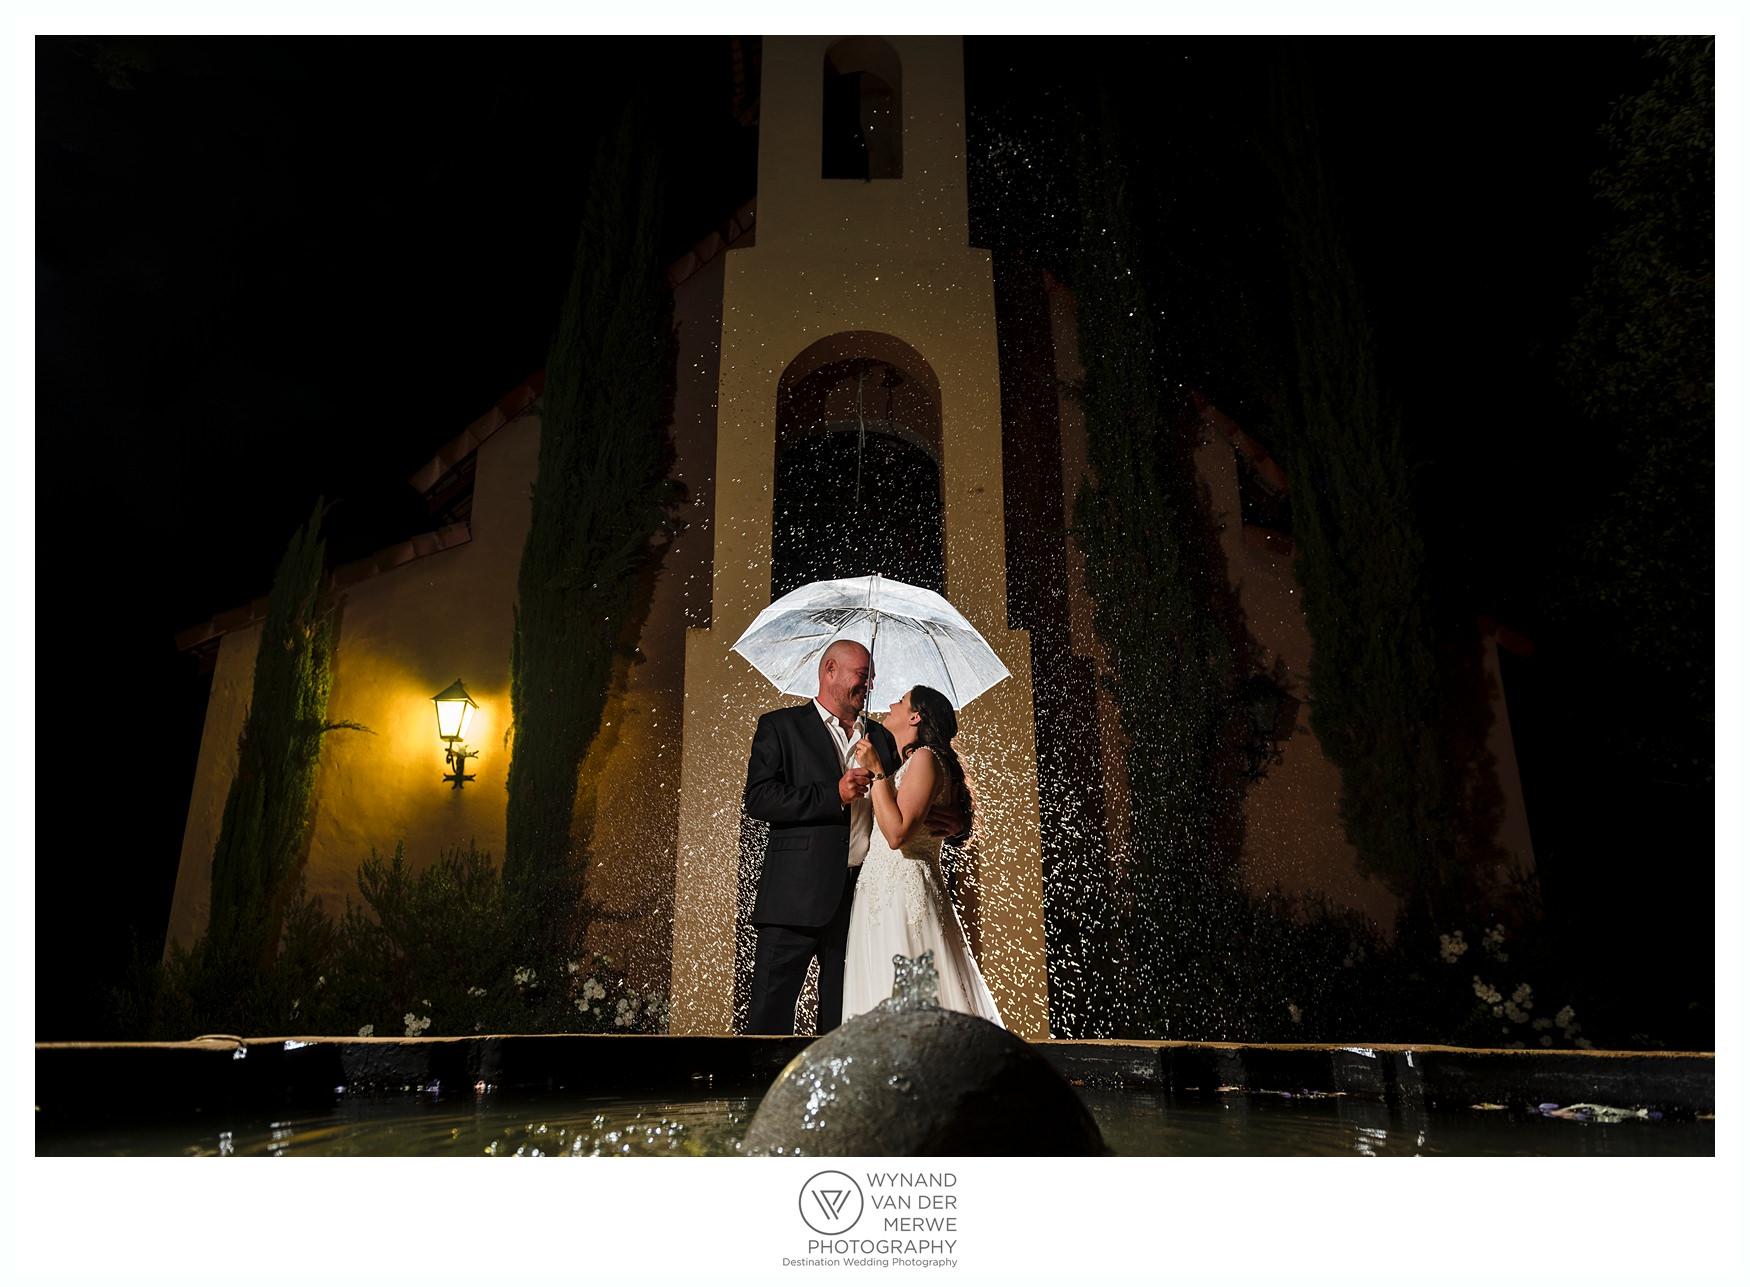 Chris and Marike's wedding at Moon and Sixpense